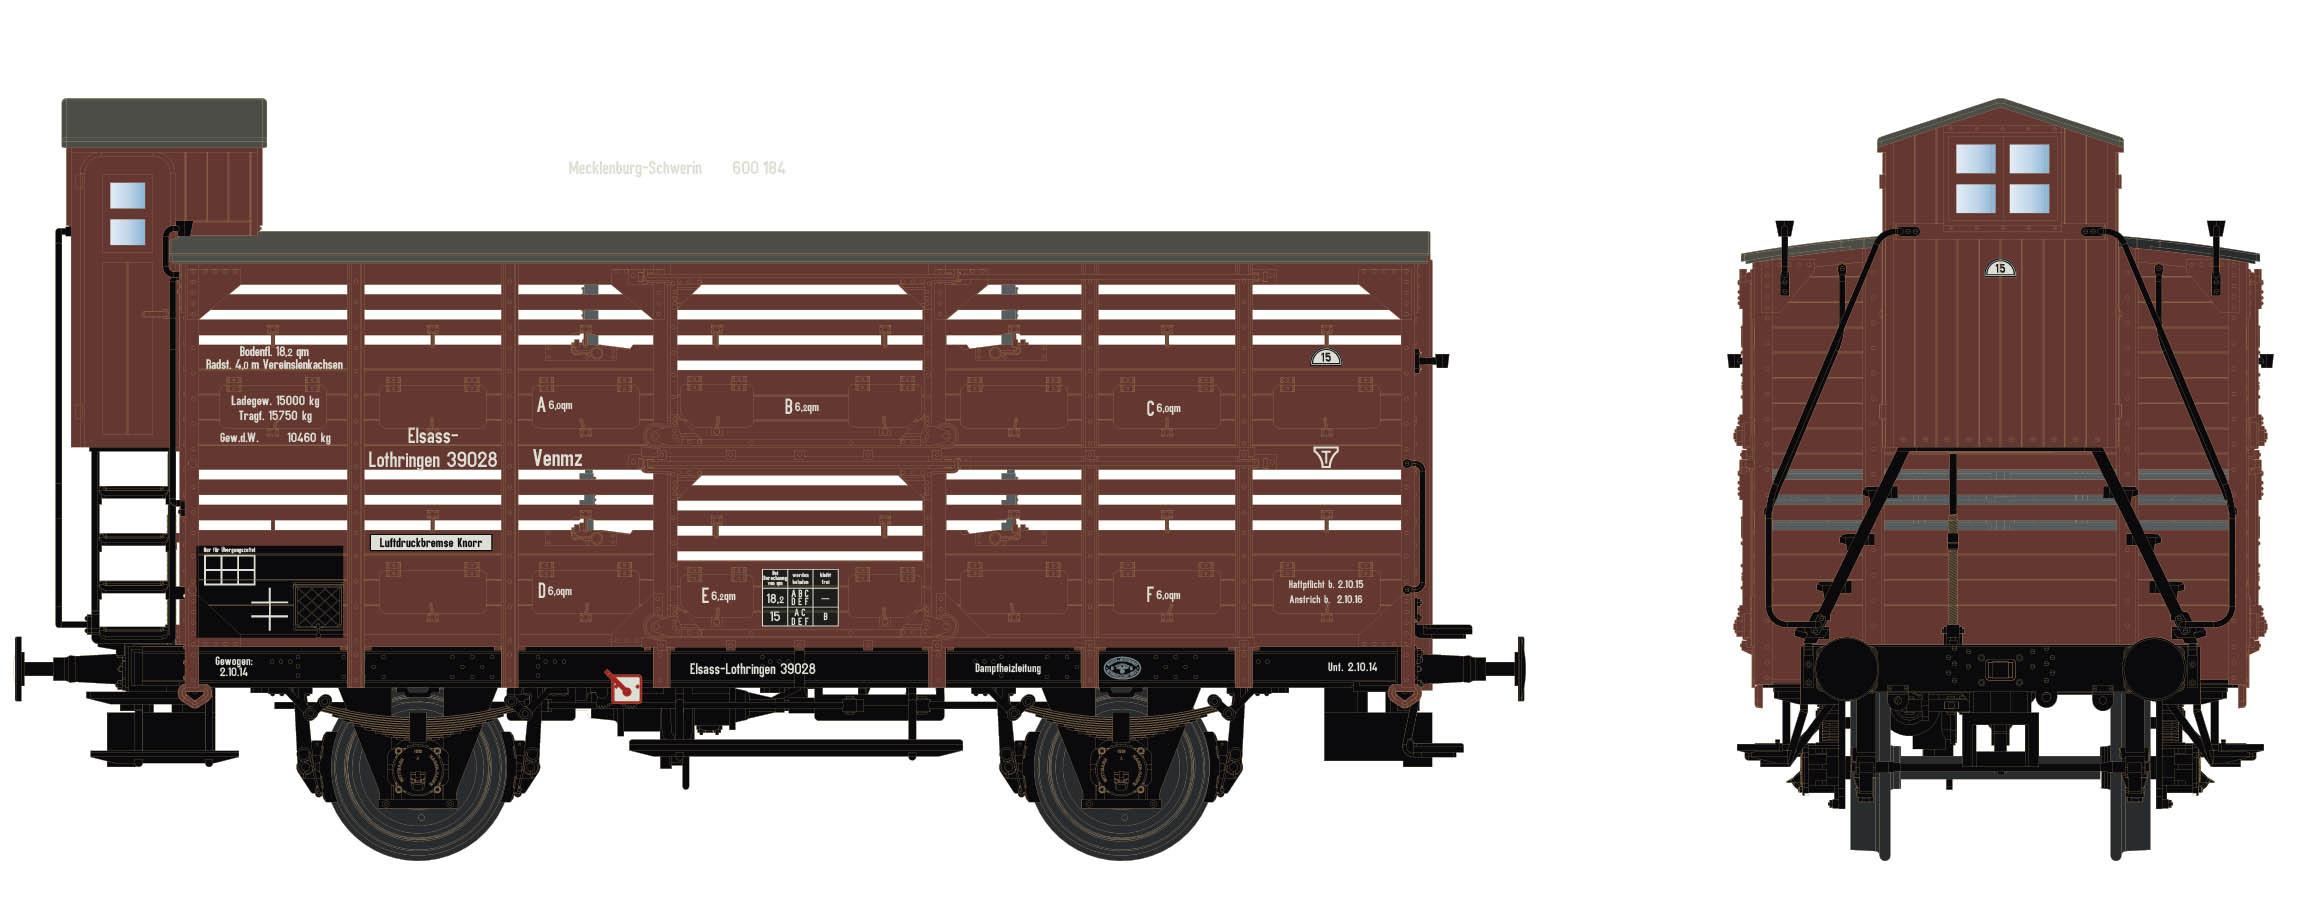 Wagenbausatz Verschlagwagen Vh14, E.L., Epoche I